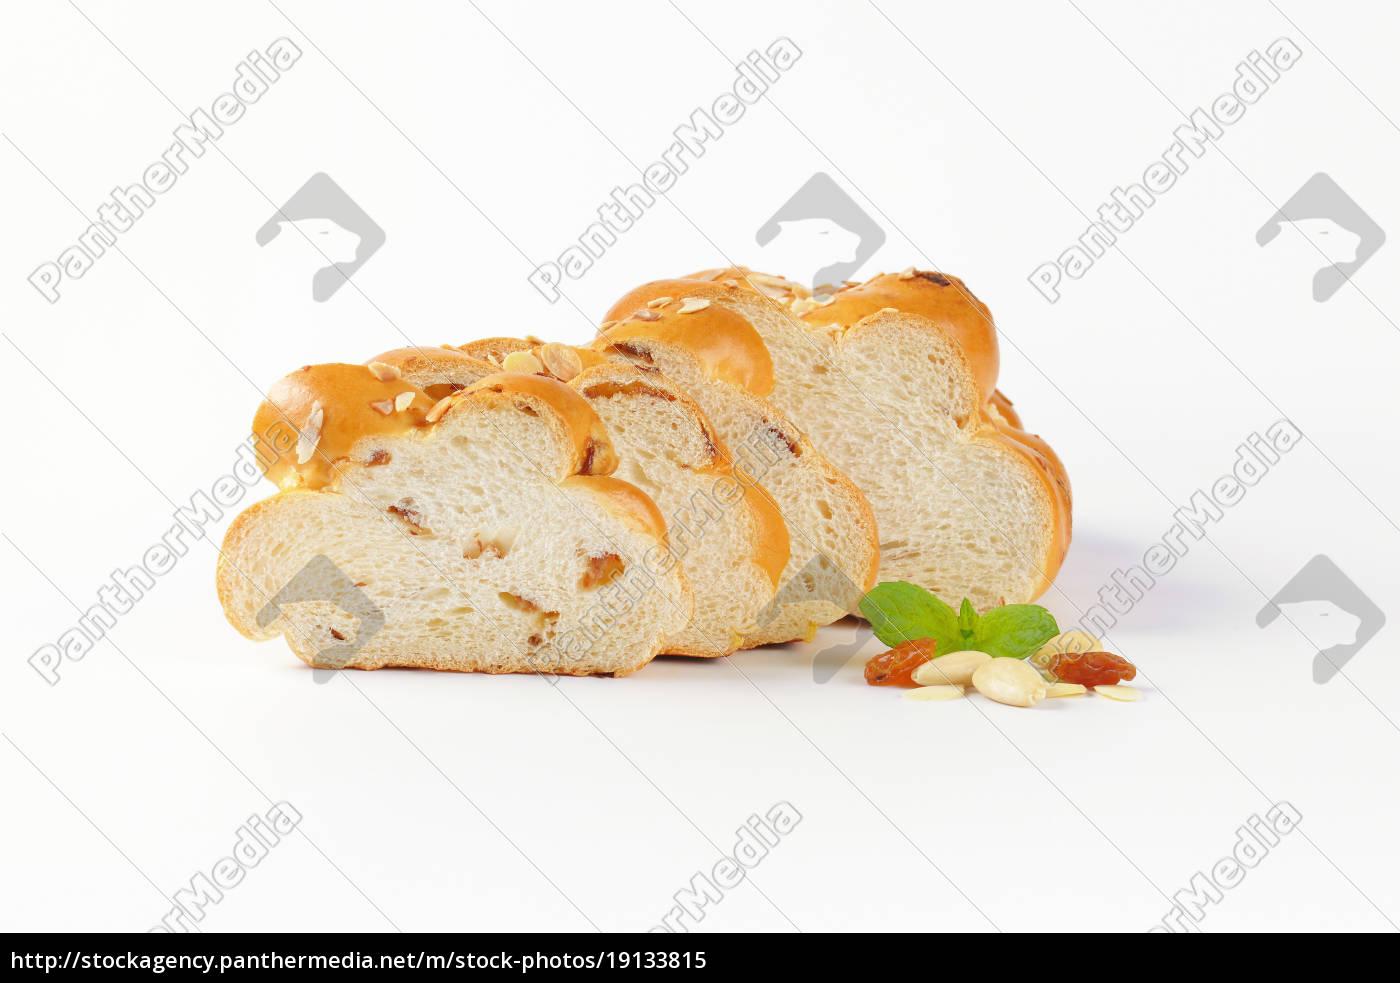 sliced, sweet, braided, bread - 19133815